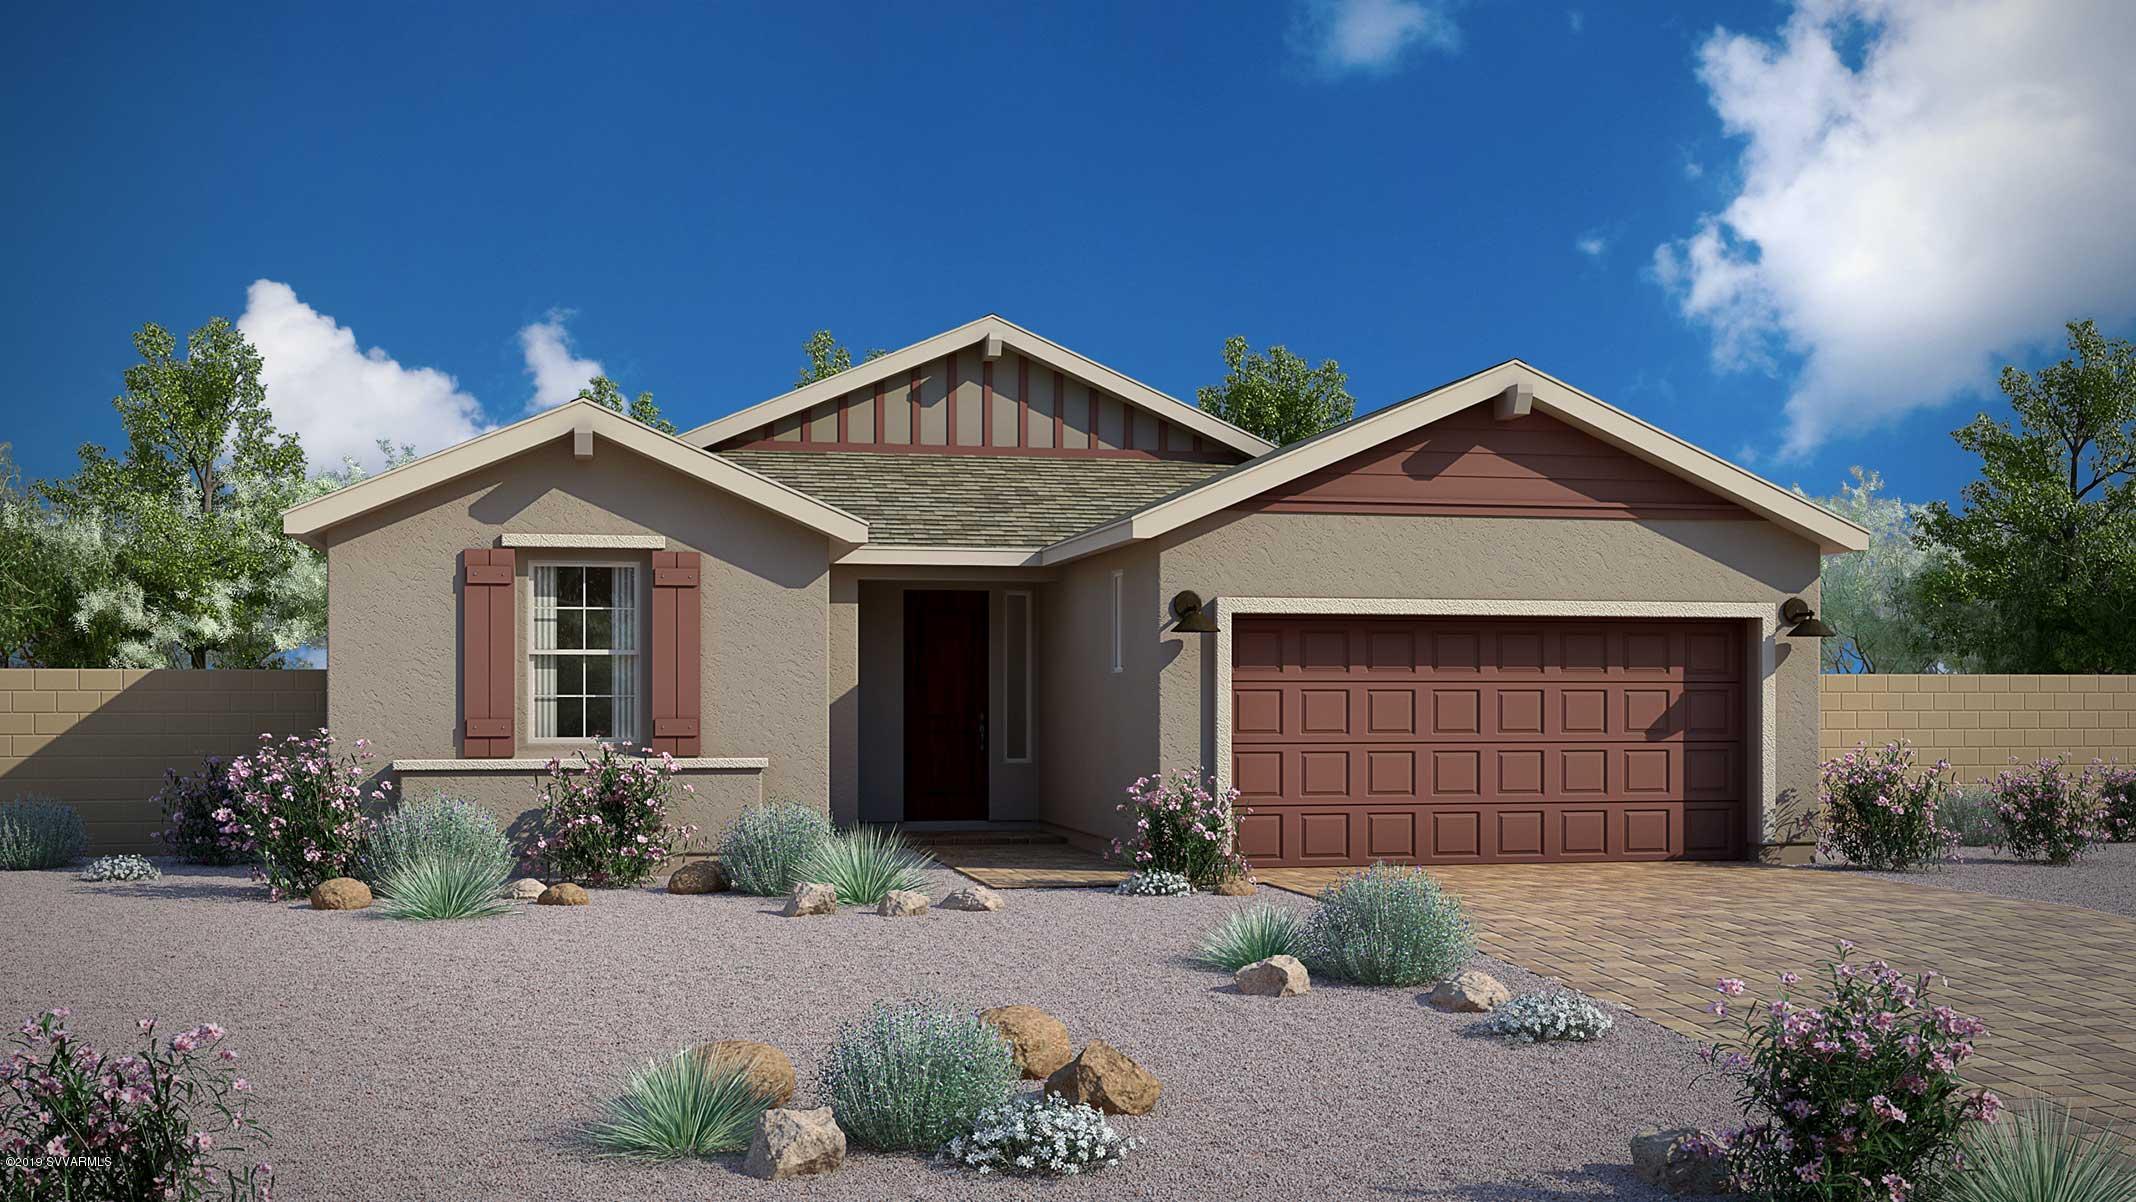 502 Miner's Gulch Drive Clarkdale, AZ 86324